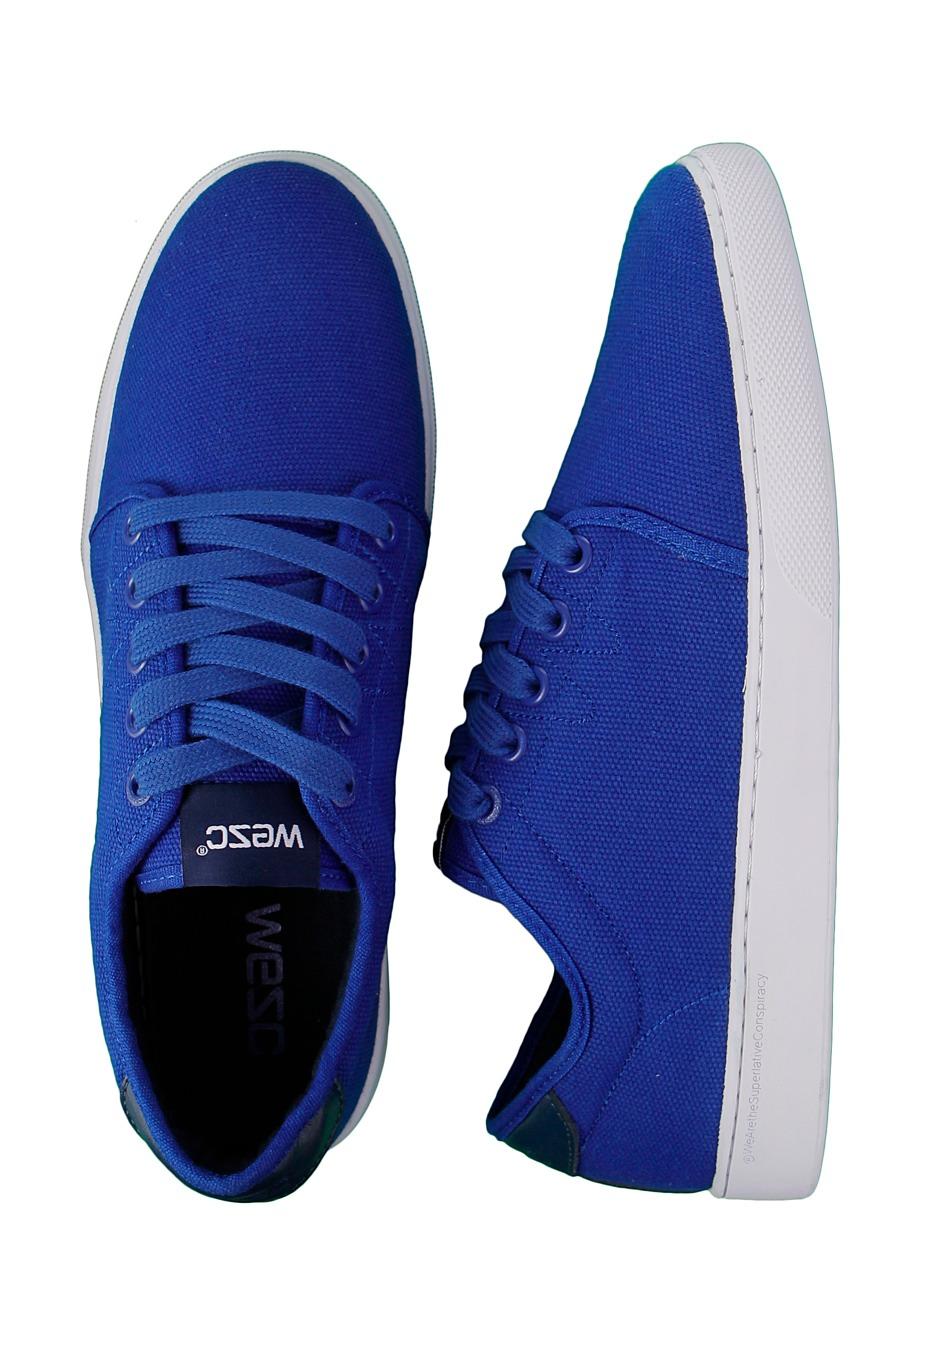 Wesc - Edmond Royal Blue - Shoes - Impericon.com Europe